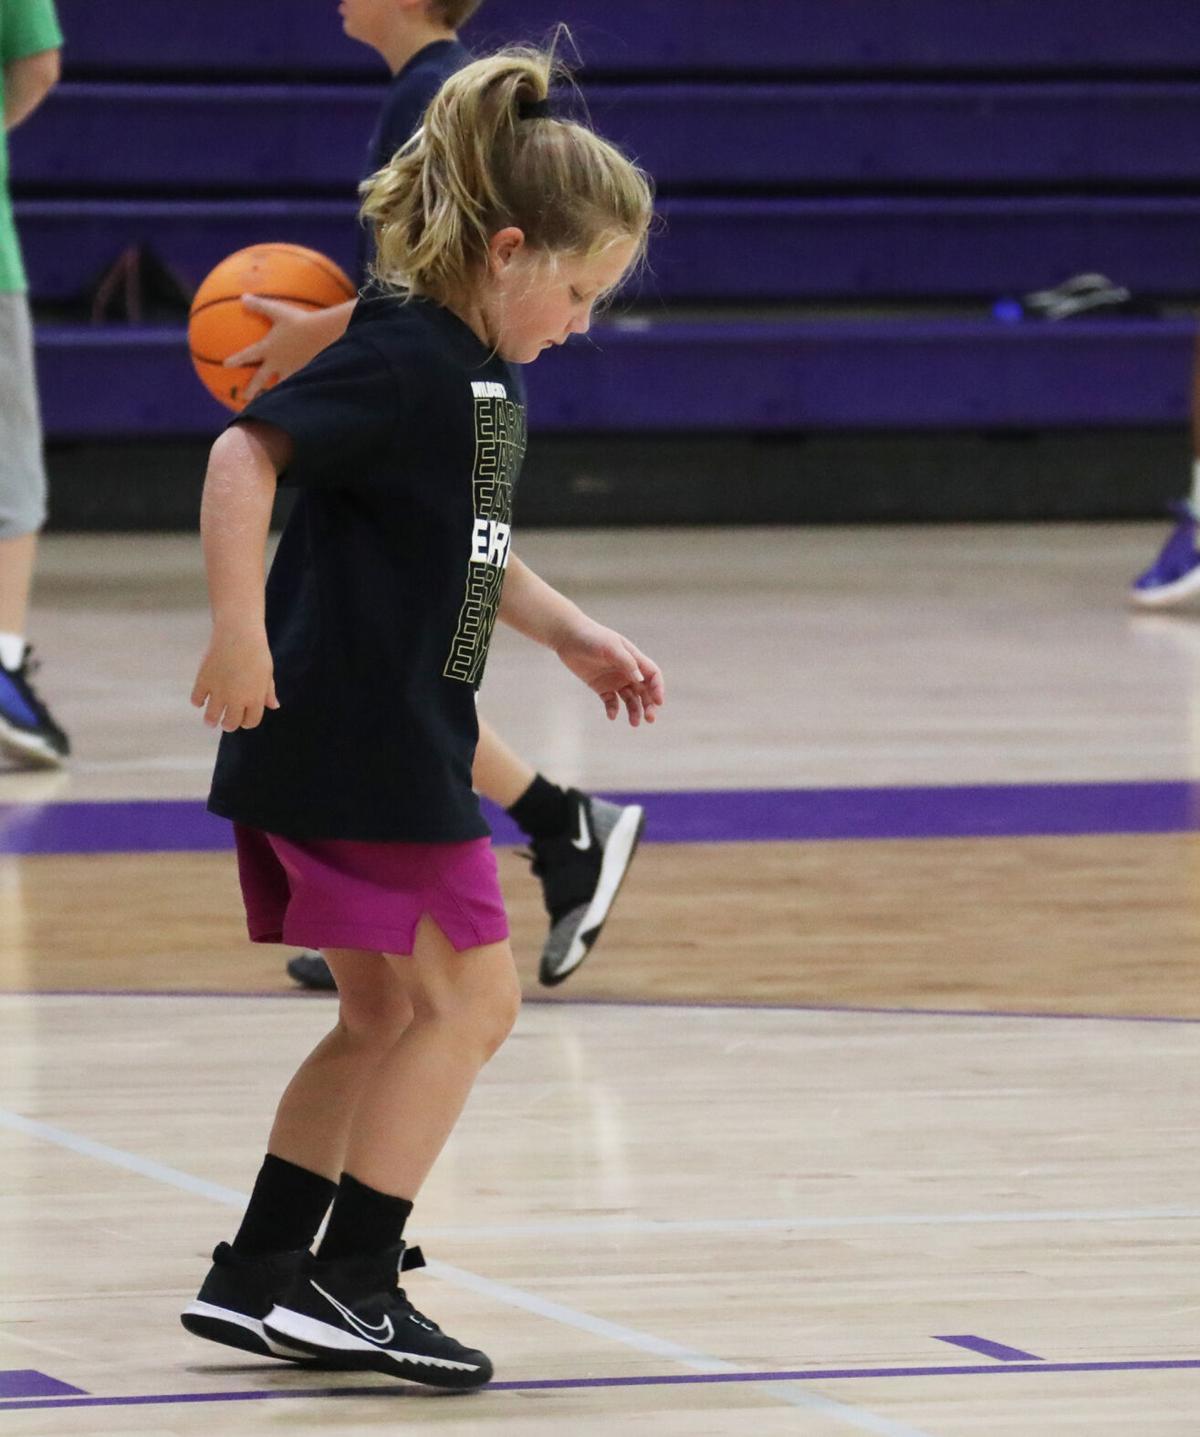 Bulldog Basketball Camp teaches game's basics, sportsmanship